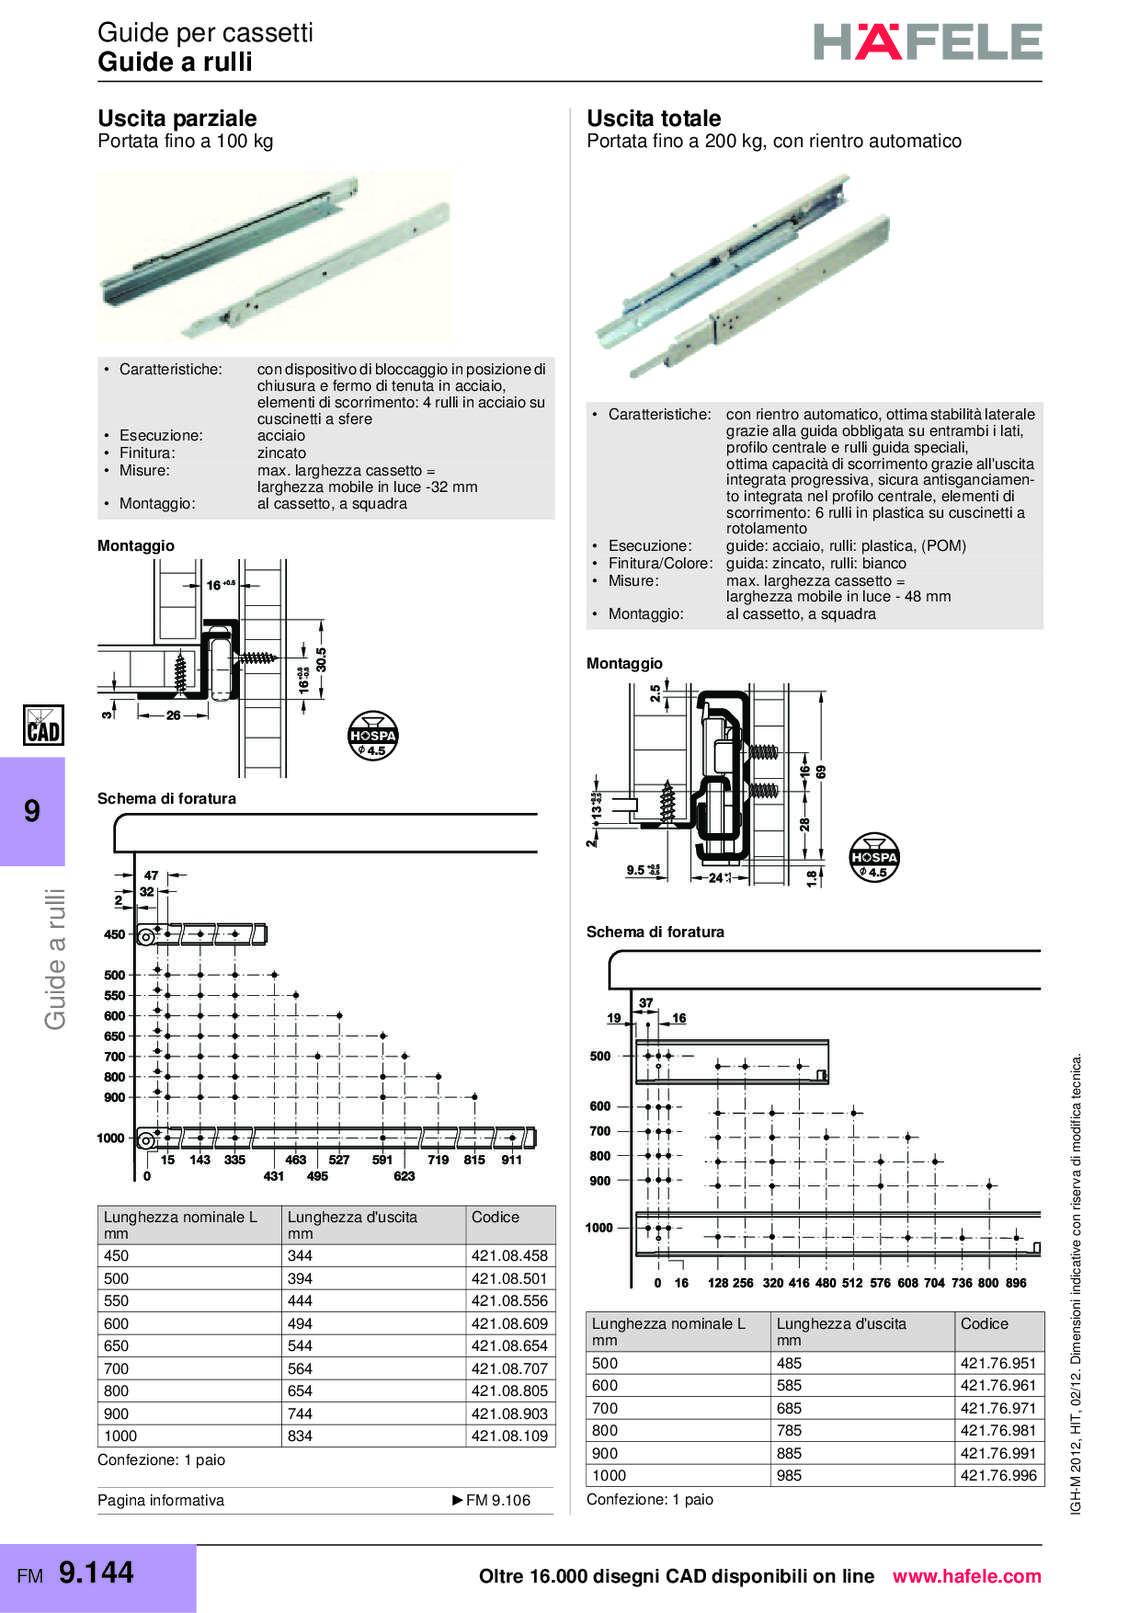 hafele-spondine-e-guide-per-mobili_40_203.jpg